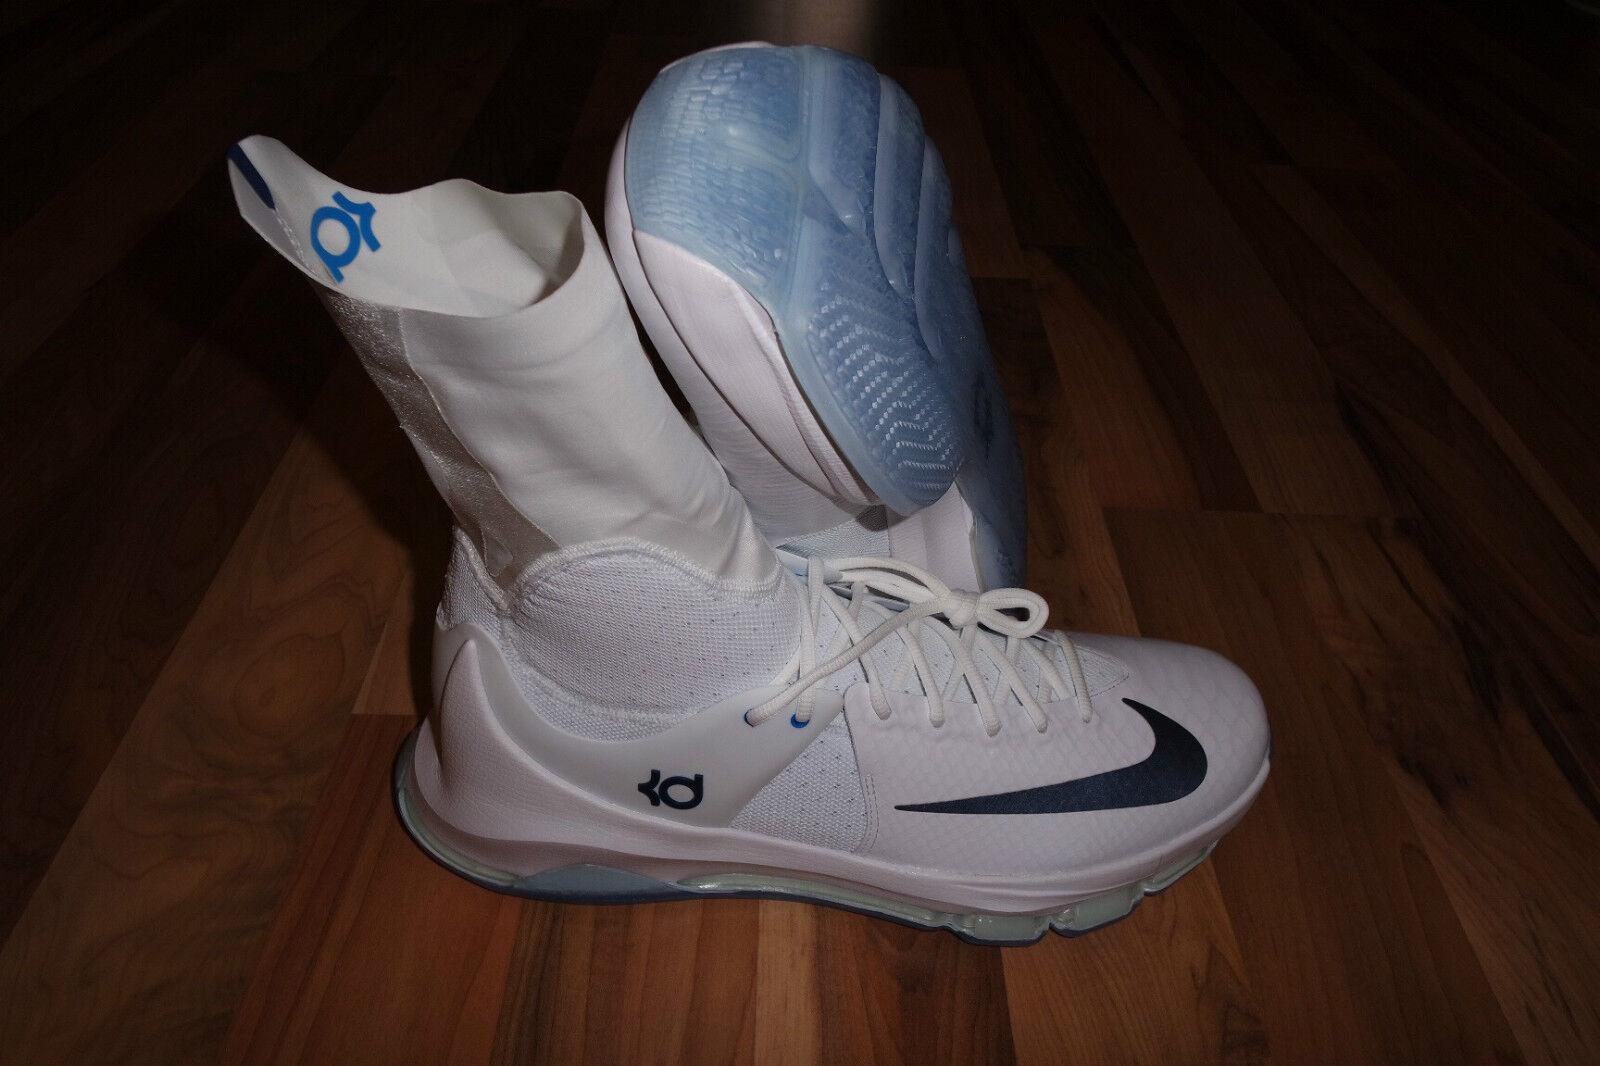 Nike KD 8 ELITE Men's Basketball Shoes 834185 144 MIDNIGH NAVY/PHOTO BLUE SZ 15